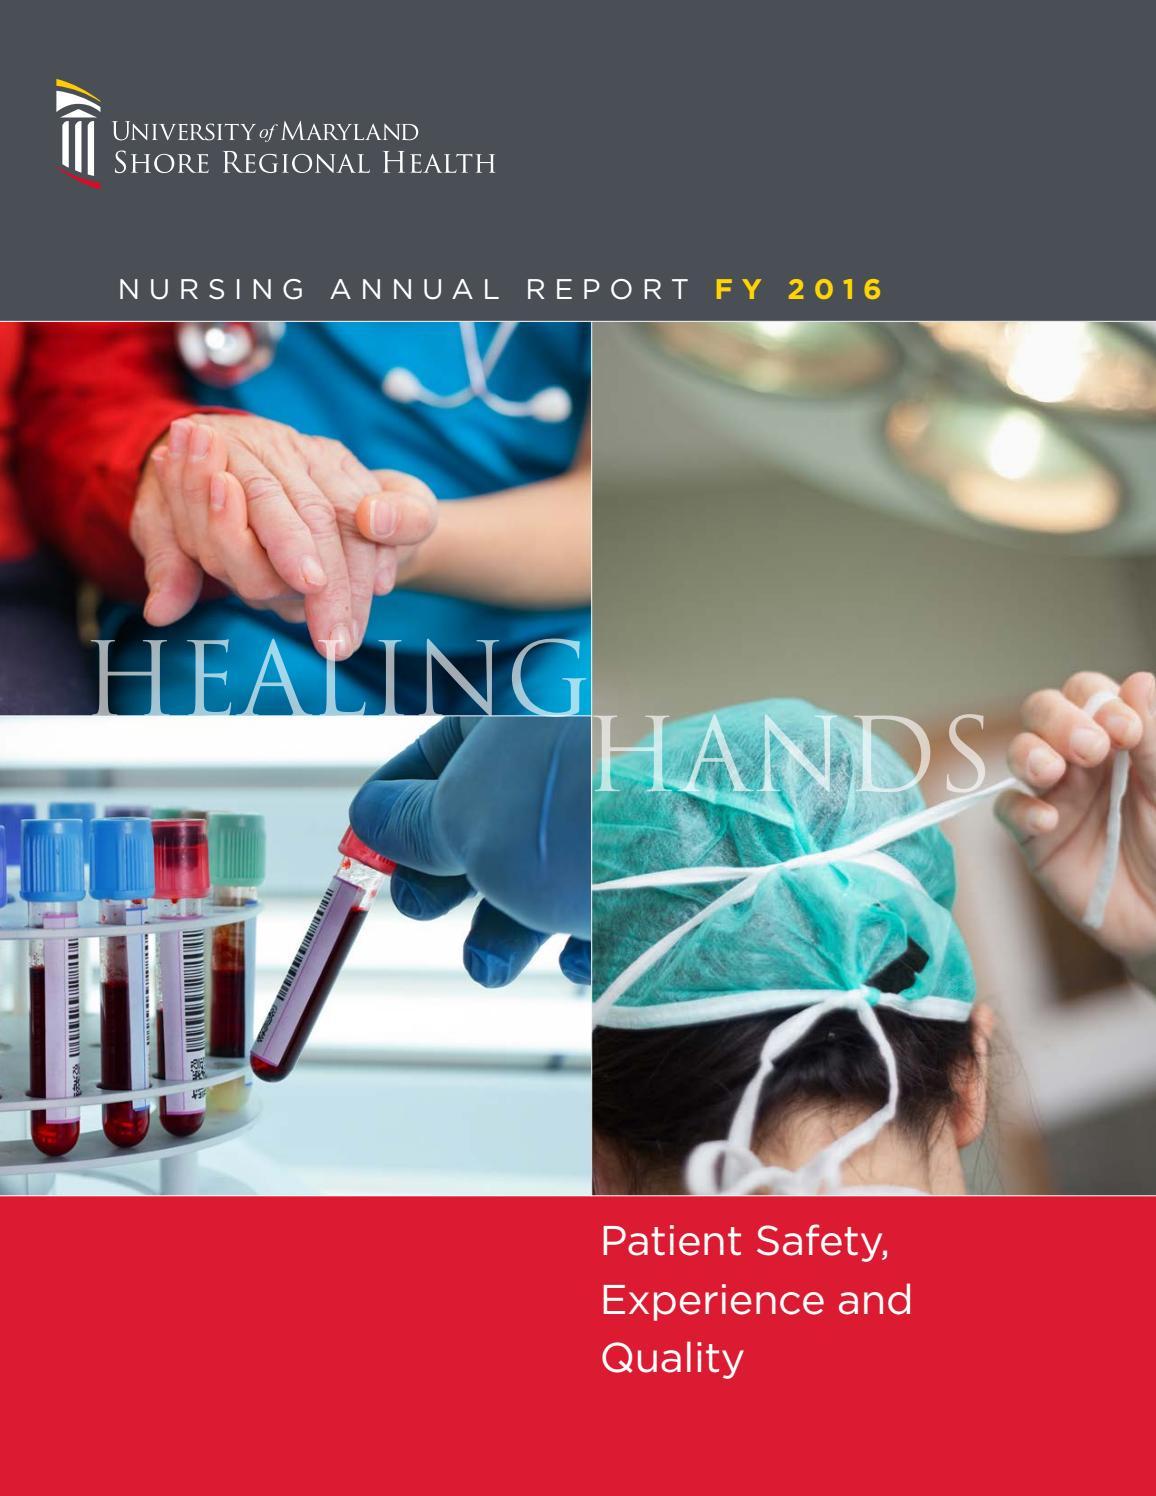 University Of Maryland Shore Regional Health Nursing Annual Report Fy 2016 By Umms Issuu